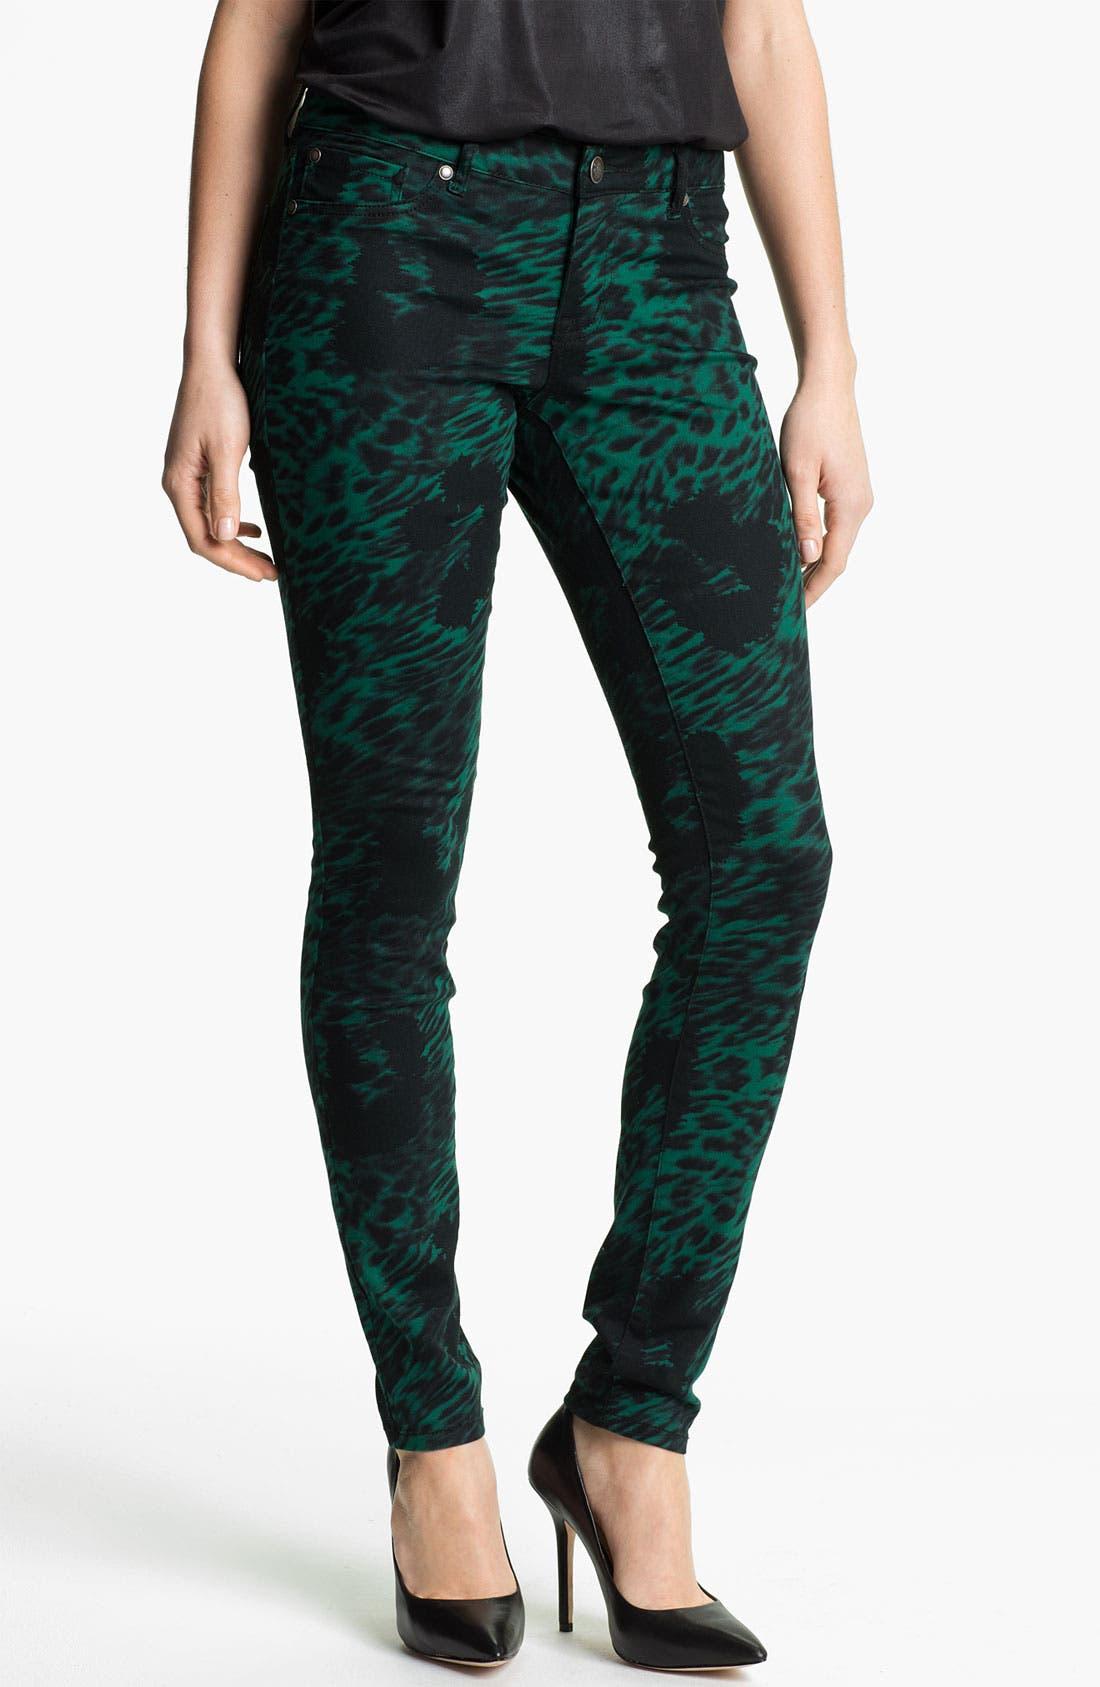 Main Image - Jessica Simpson 'Kiss Me' Print Twill Skinny Jeans